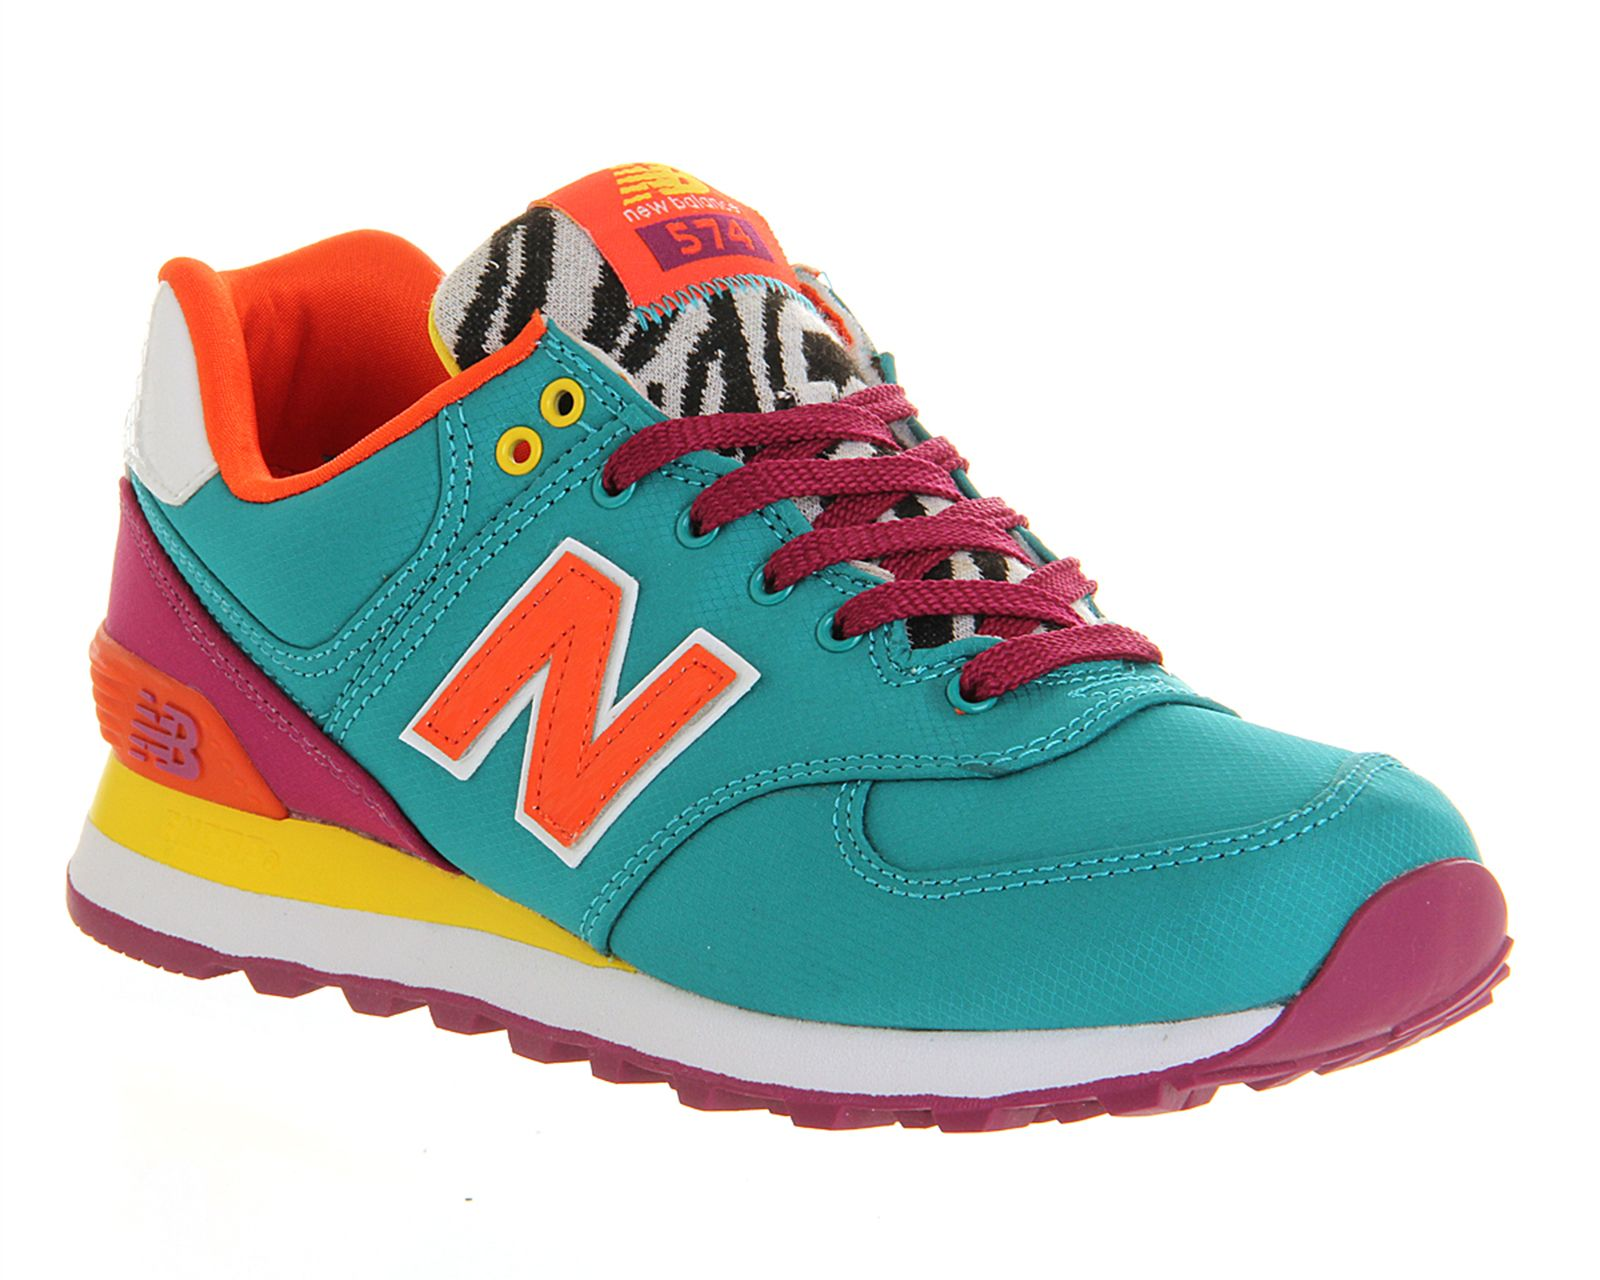 New Balance Wl574 Turquoise Orange Purple - Hers trainers